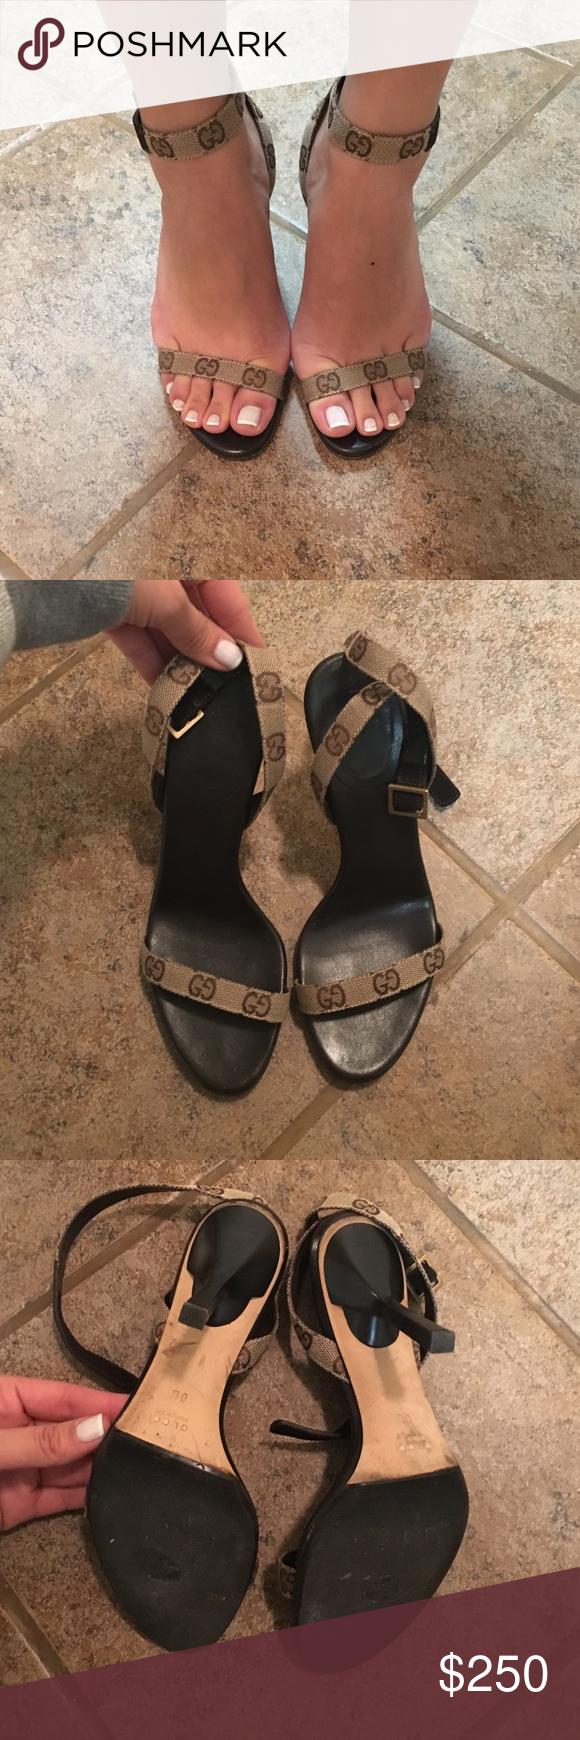 Auth. Gucci Monogram strappy heels